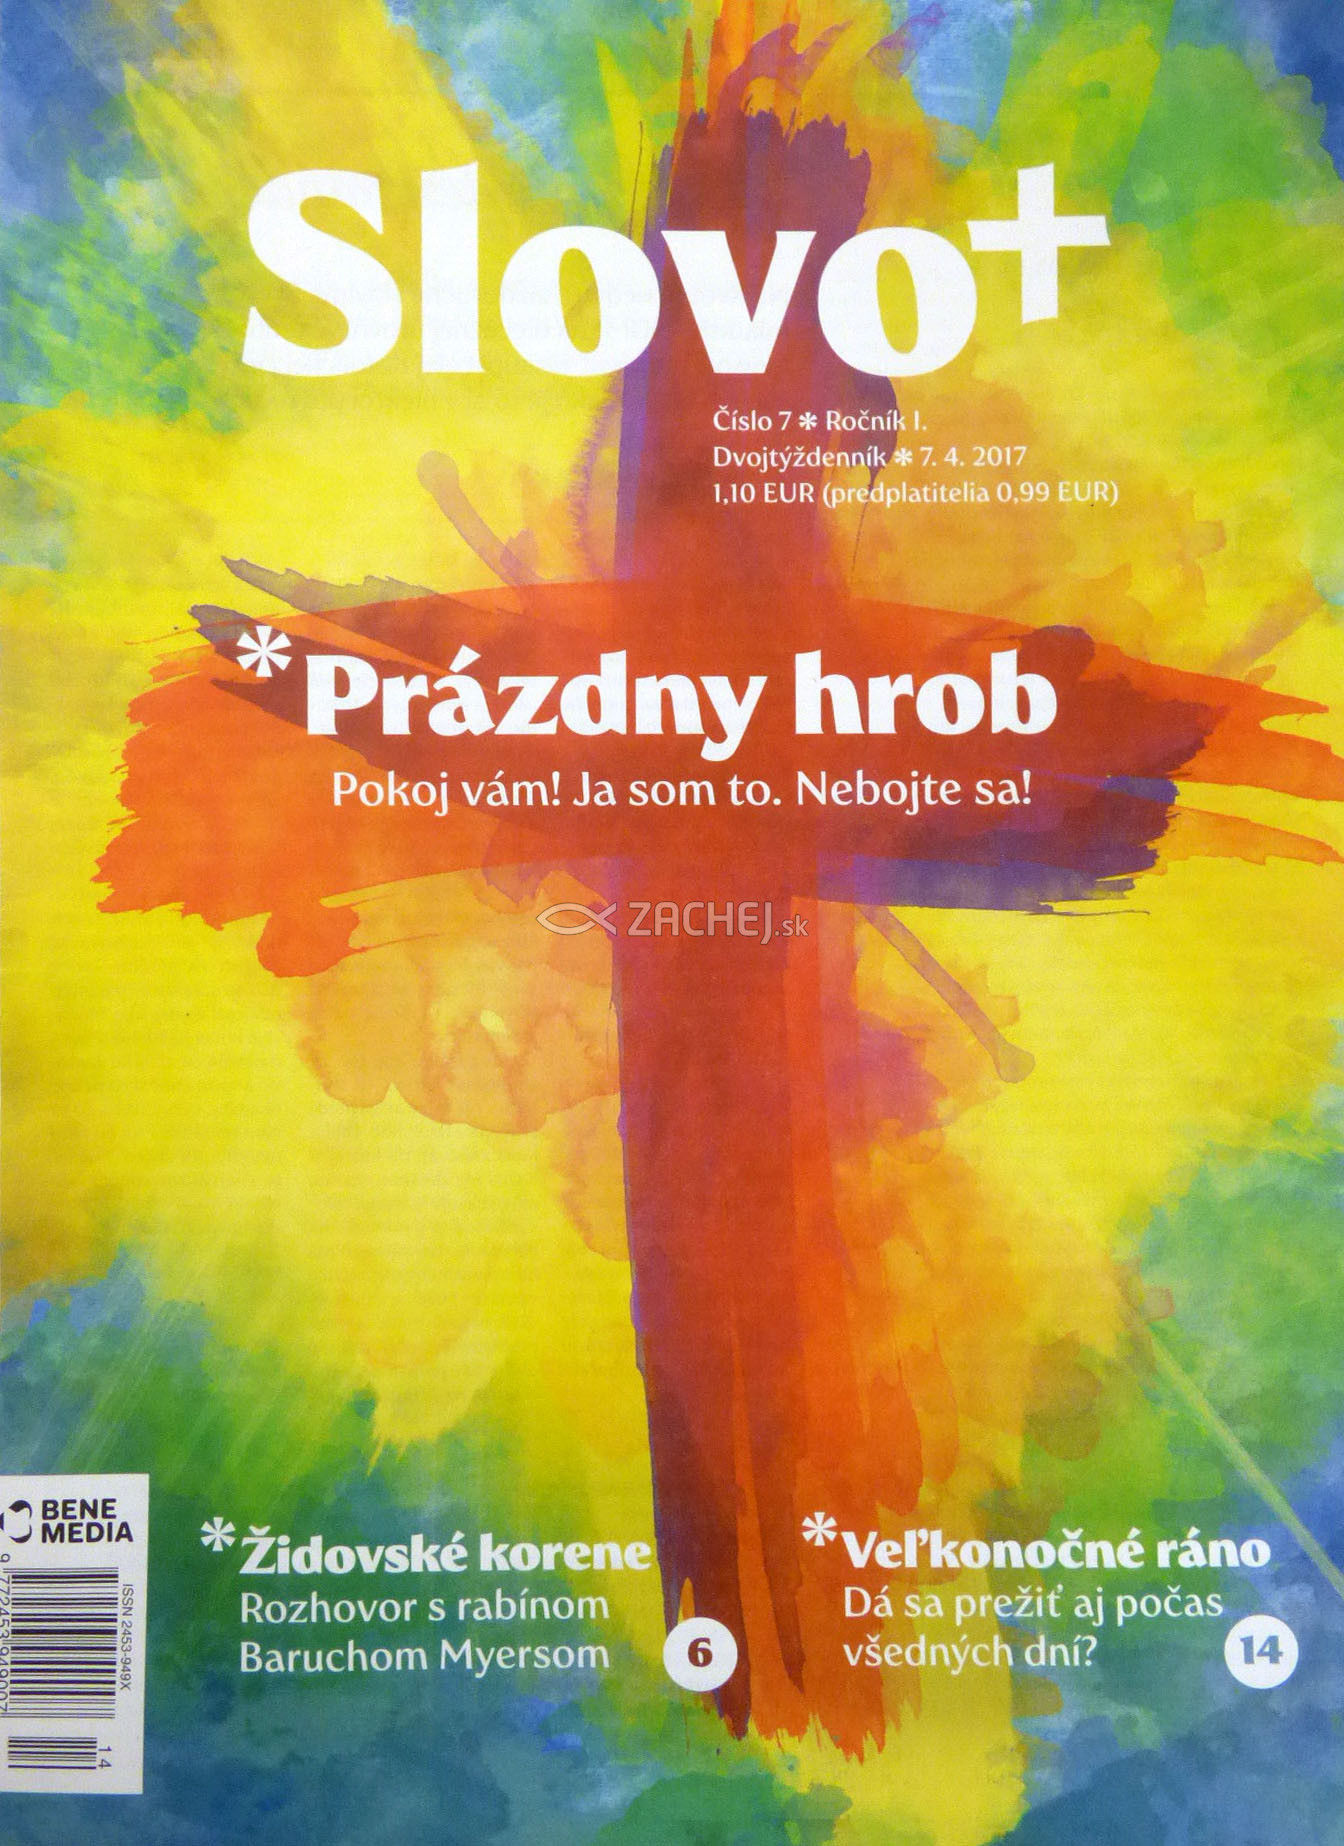 Časopis: Slovo+ 7/2017 - Kresťanské noviny, dvojtýždenník